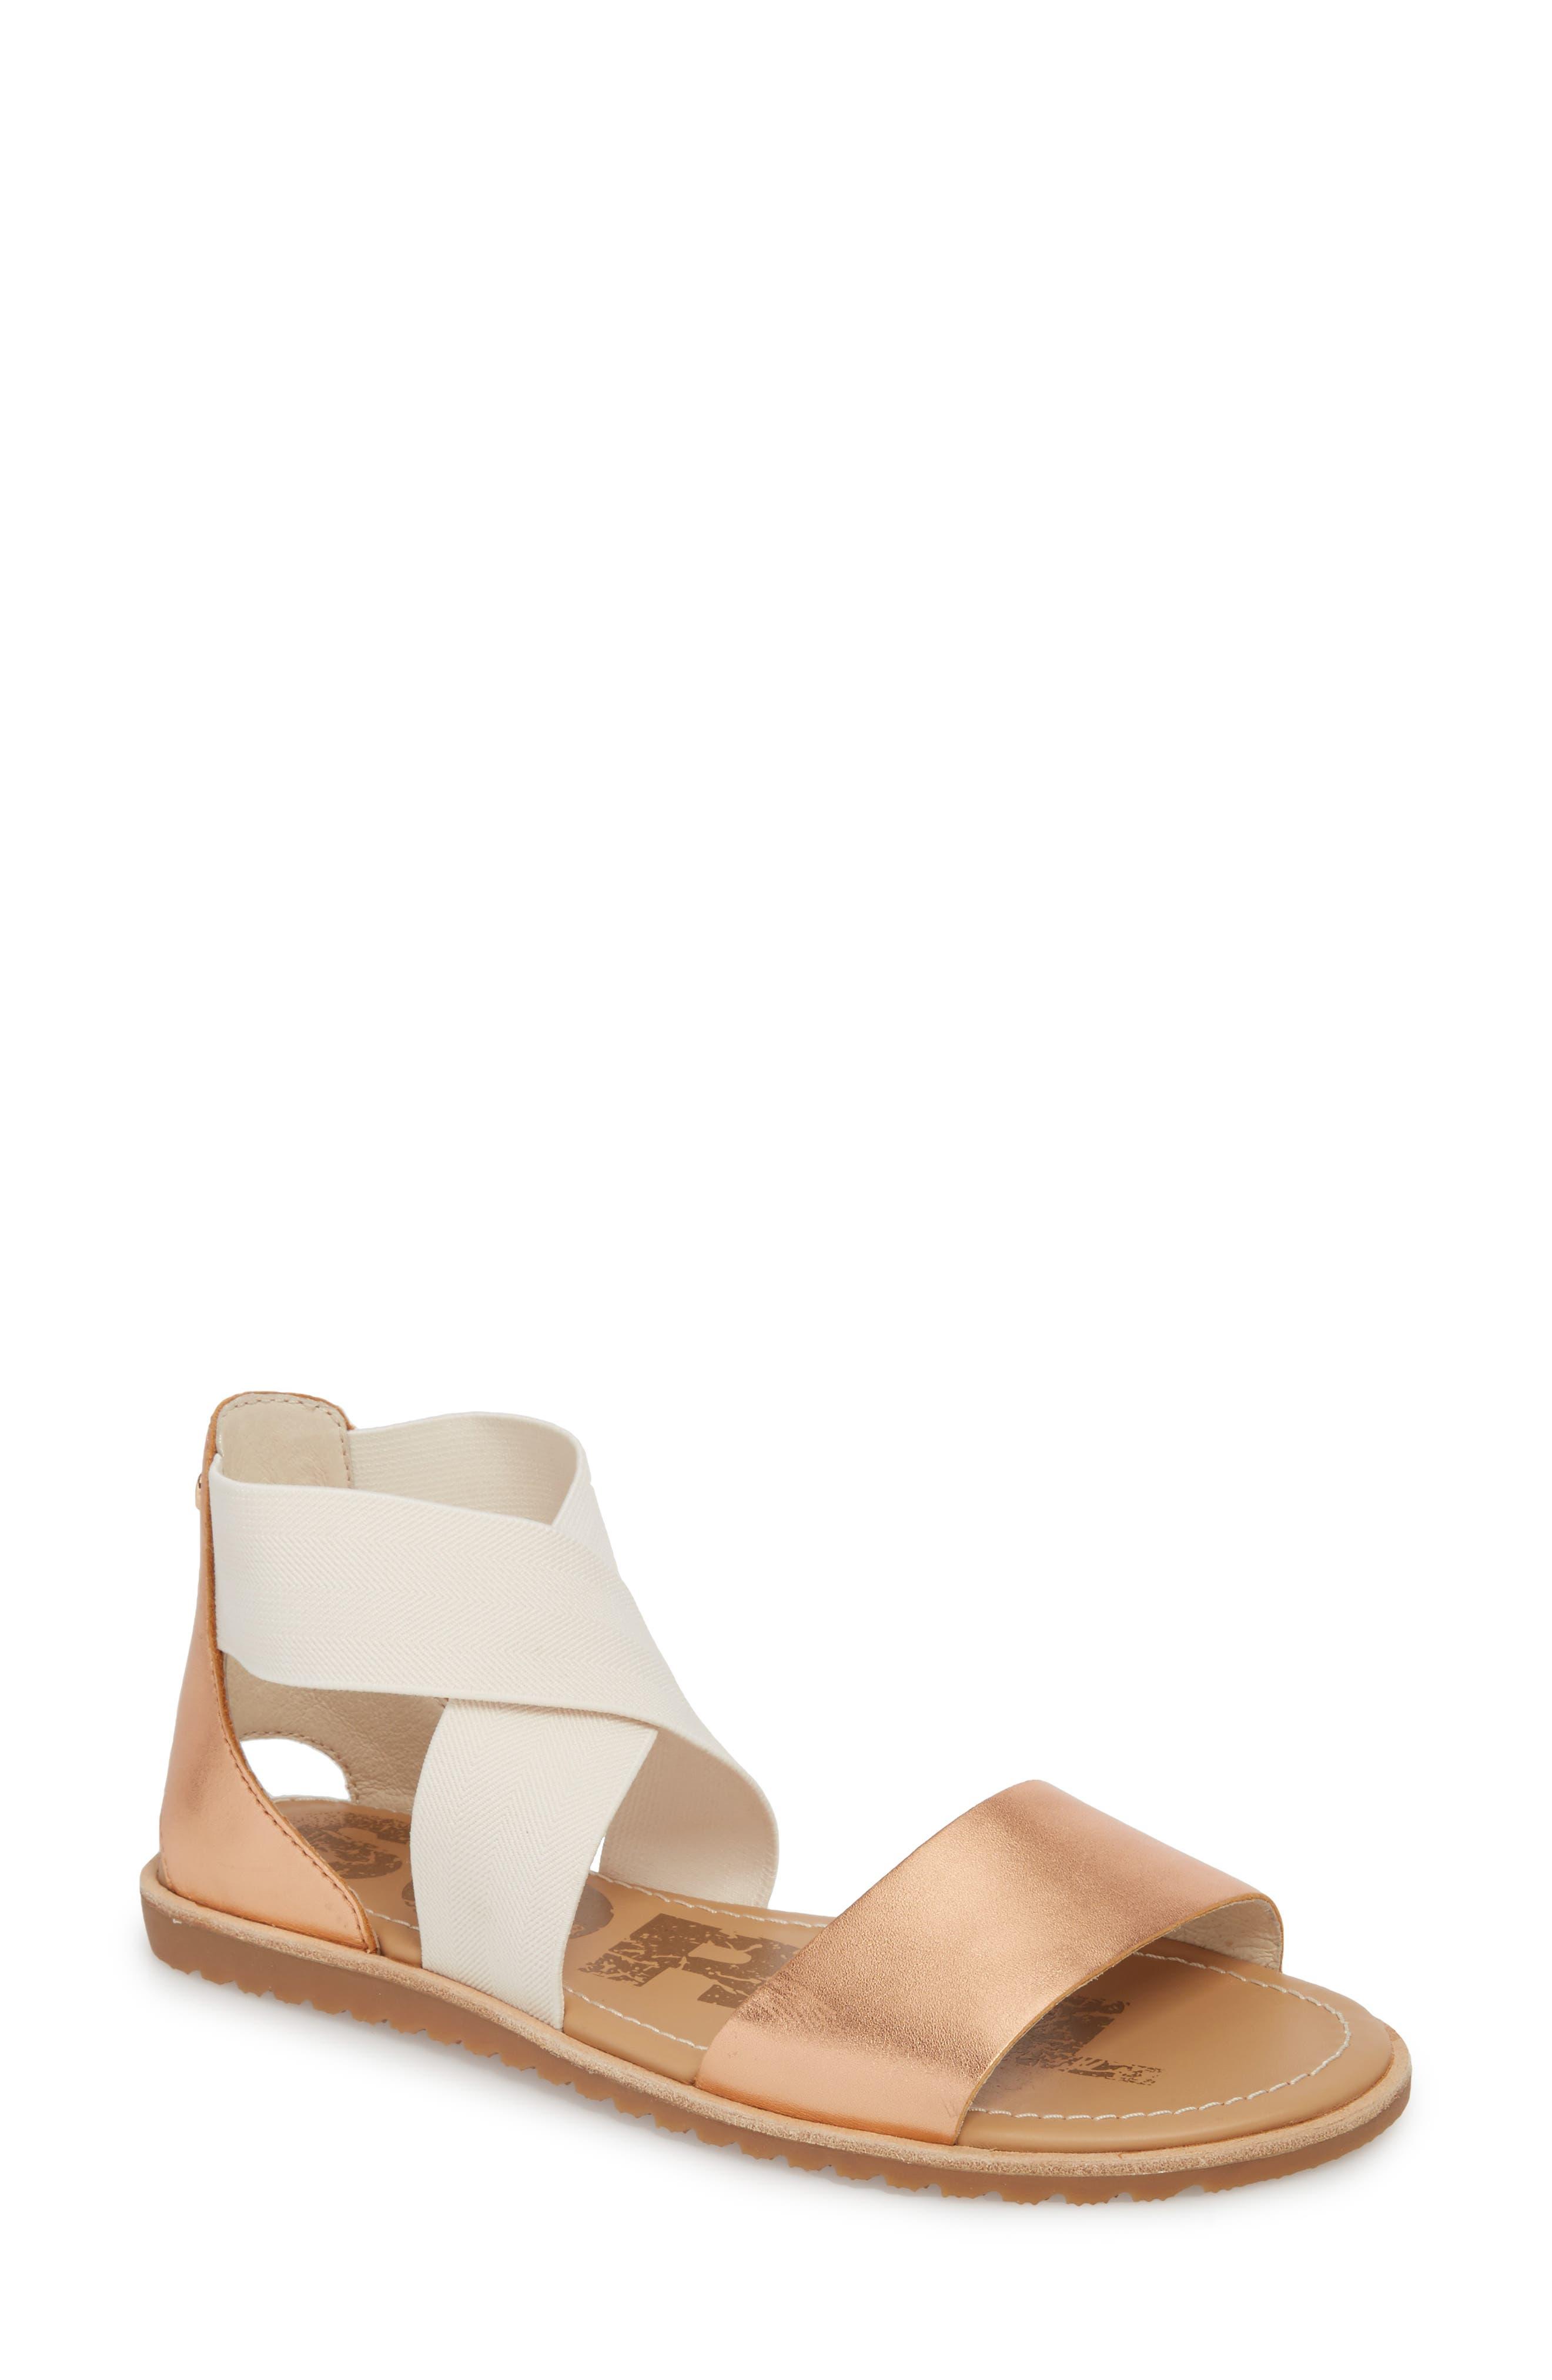 sorel Women's Ella Crisscross Ankle Strap Sandals YRhjB3Kr